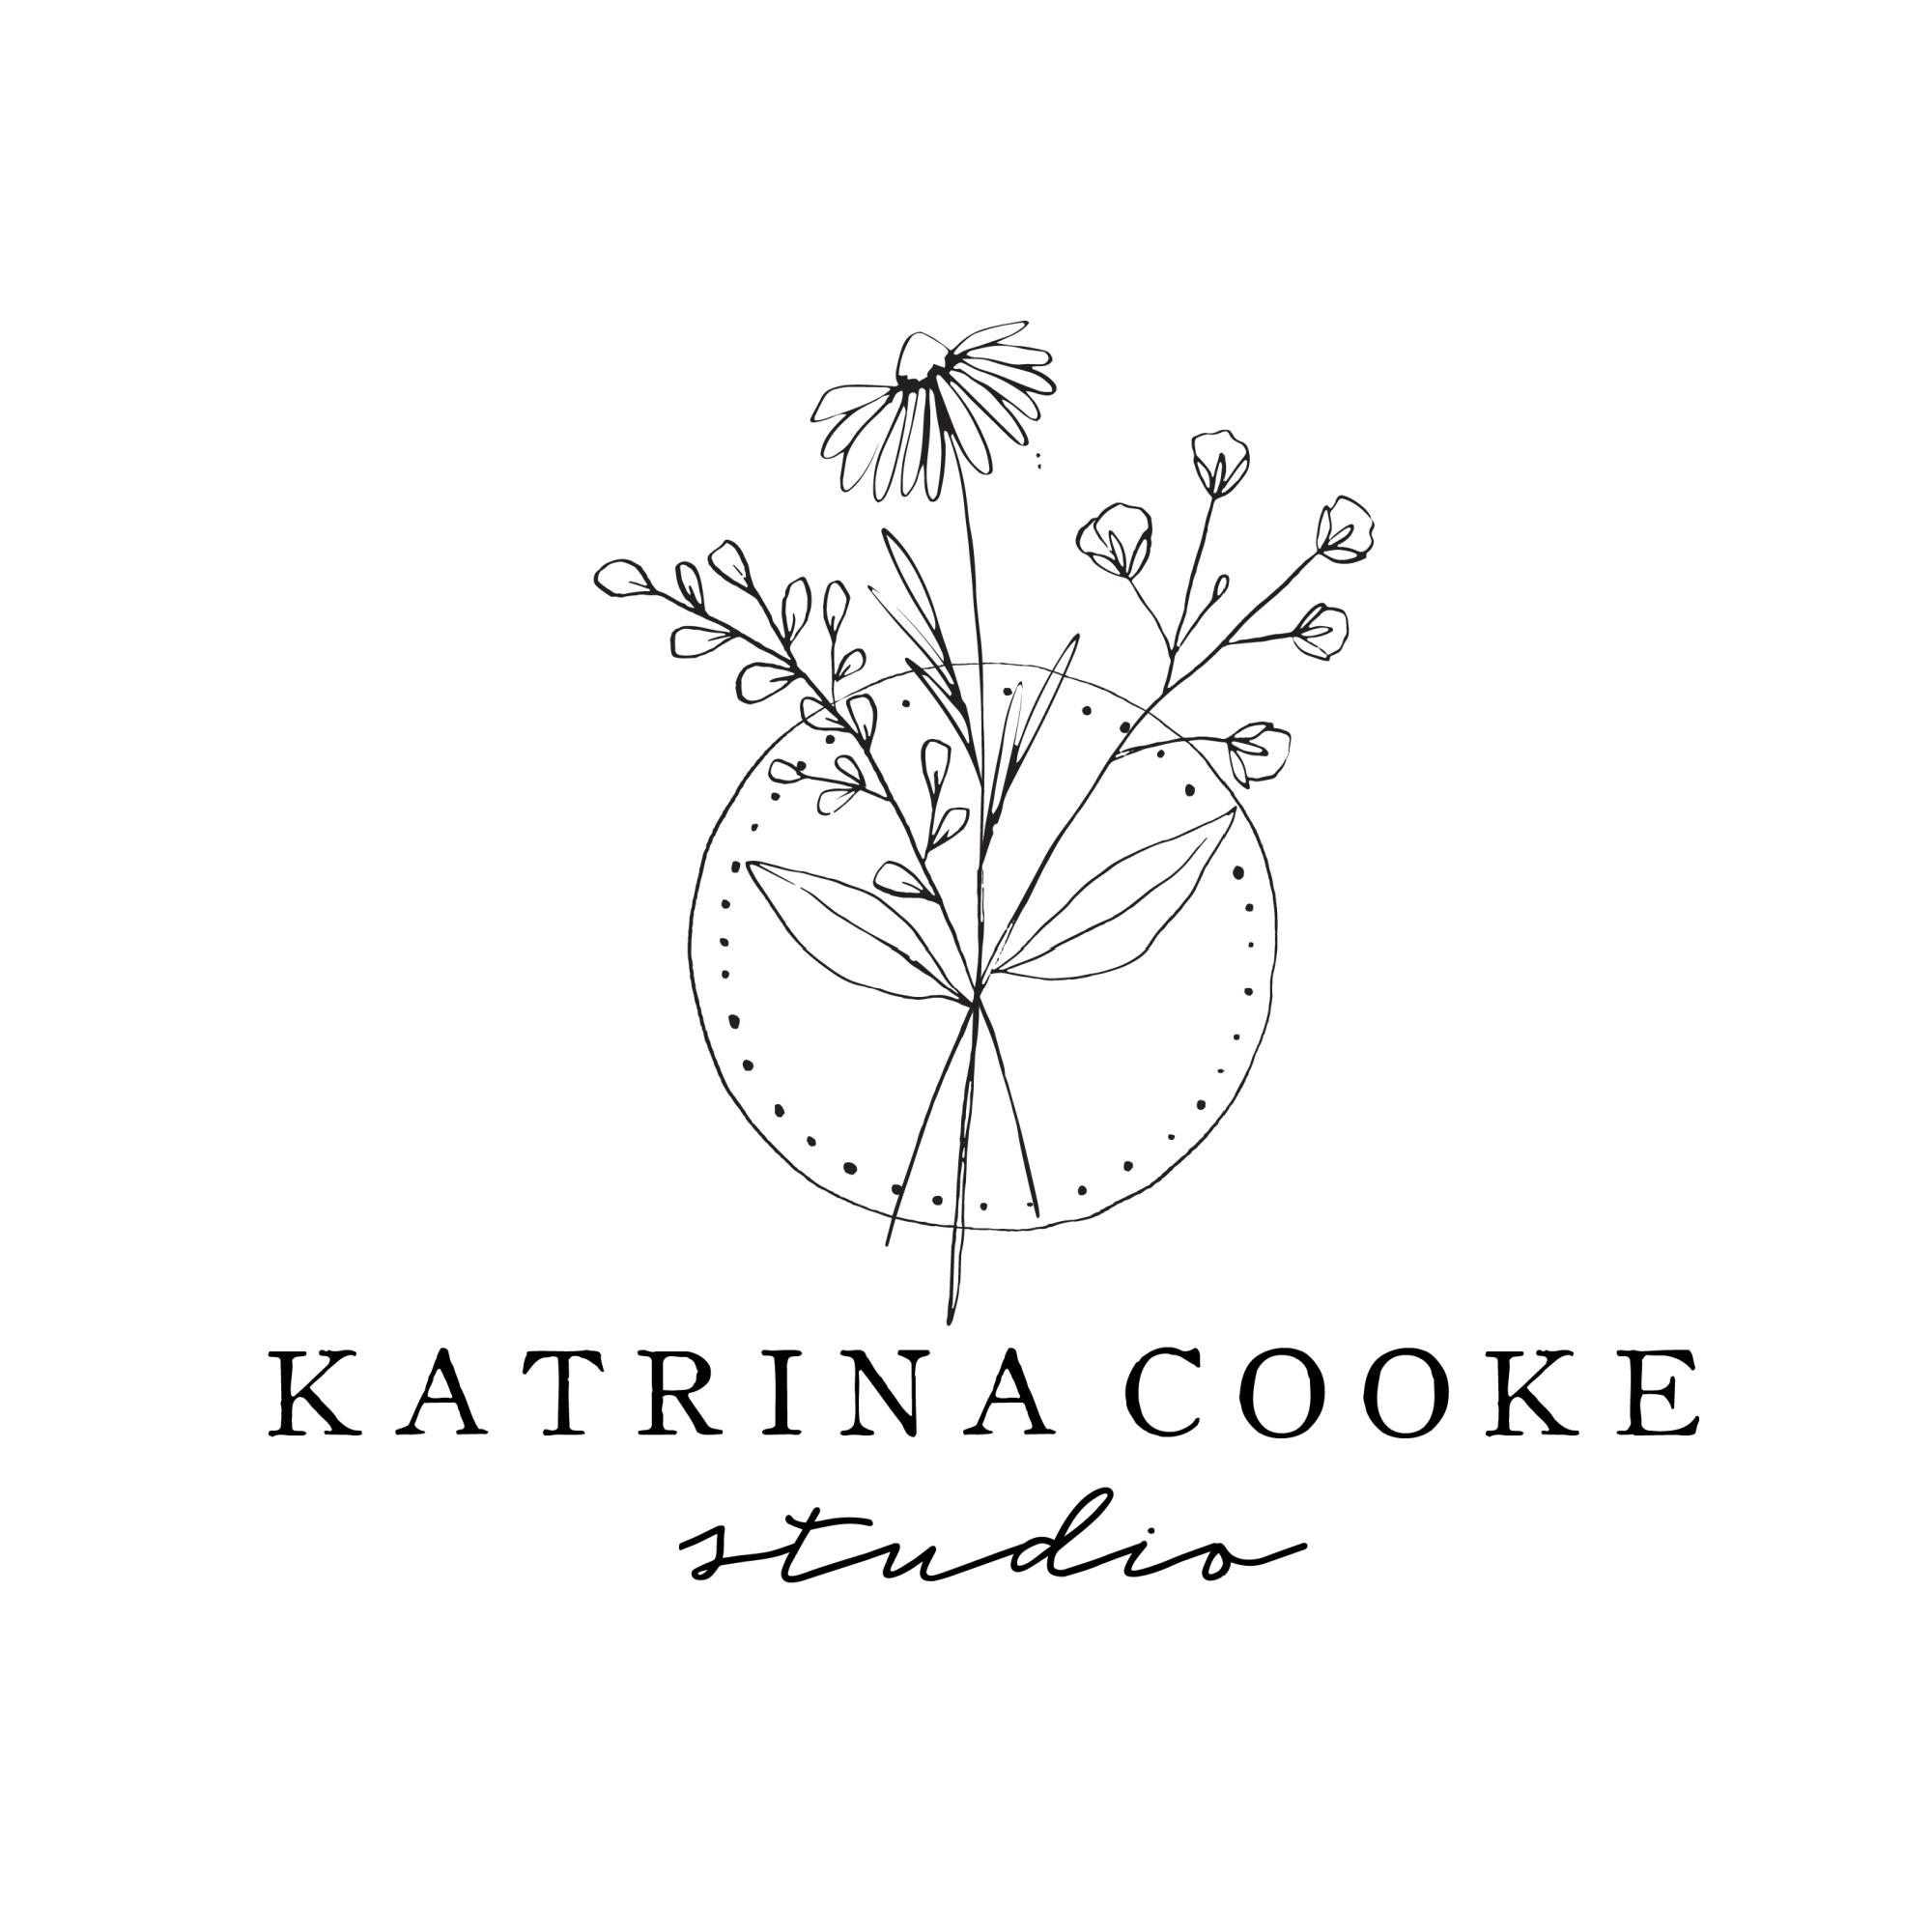 Katrina Cooke Studio